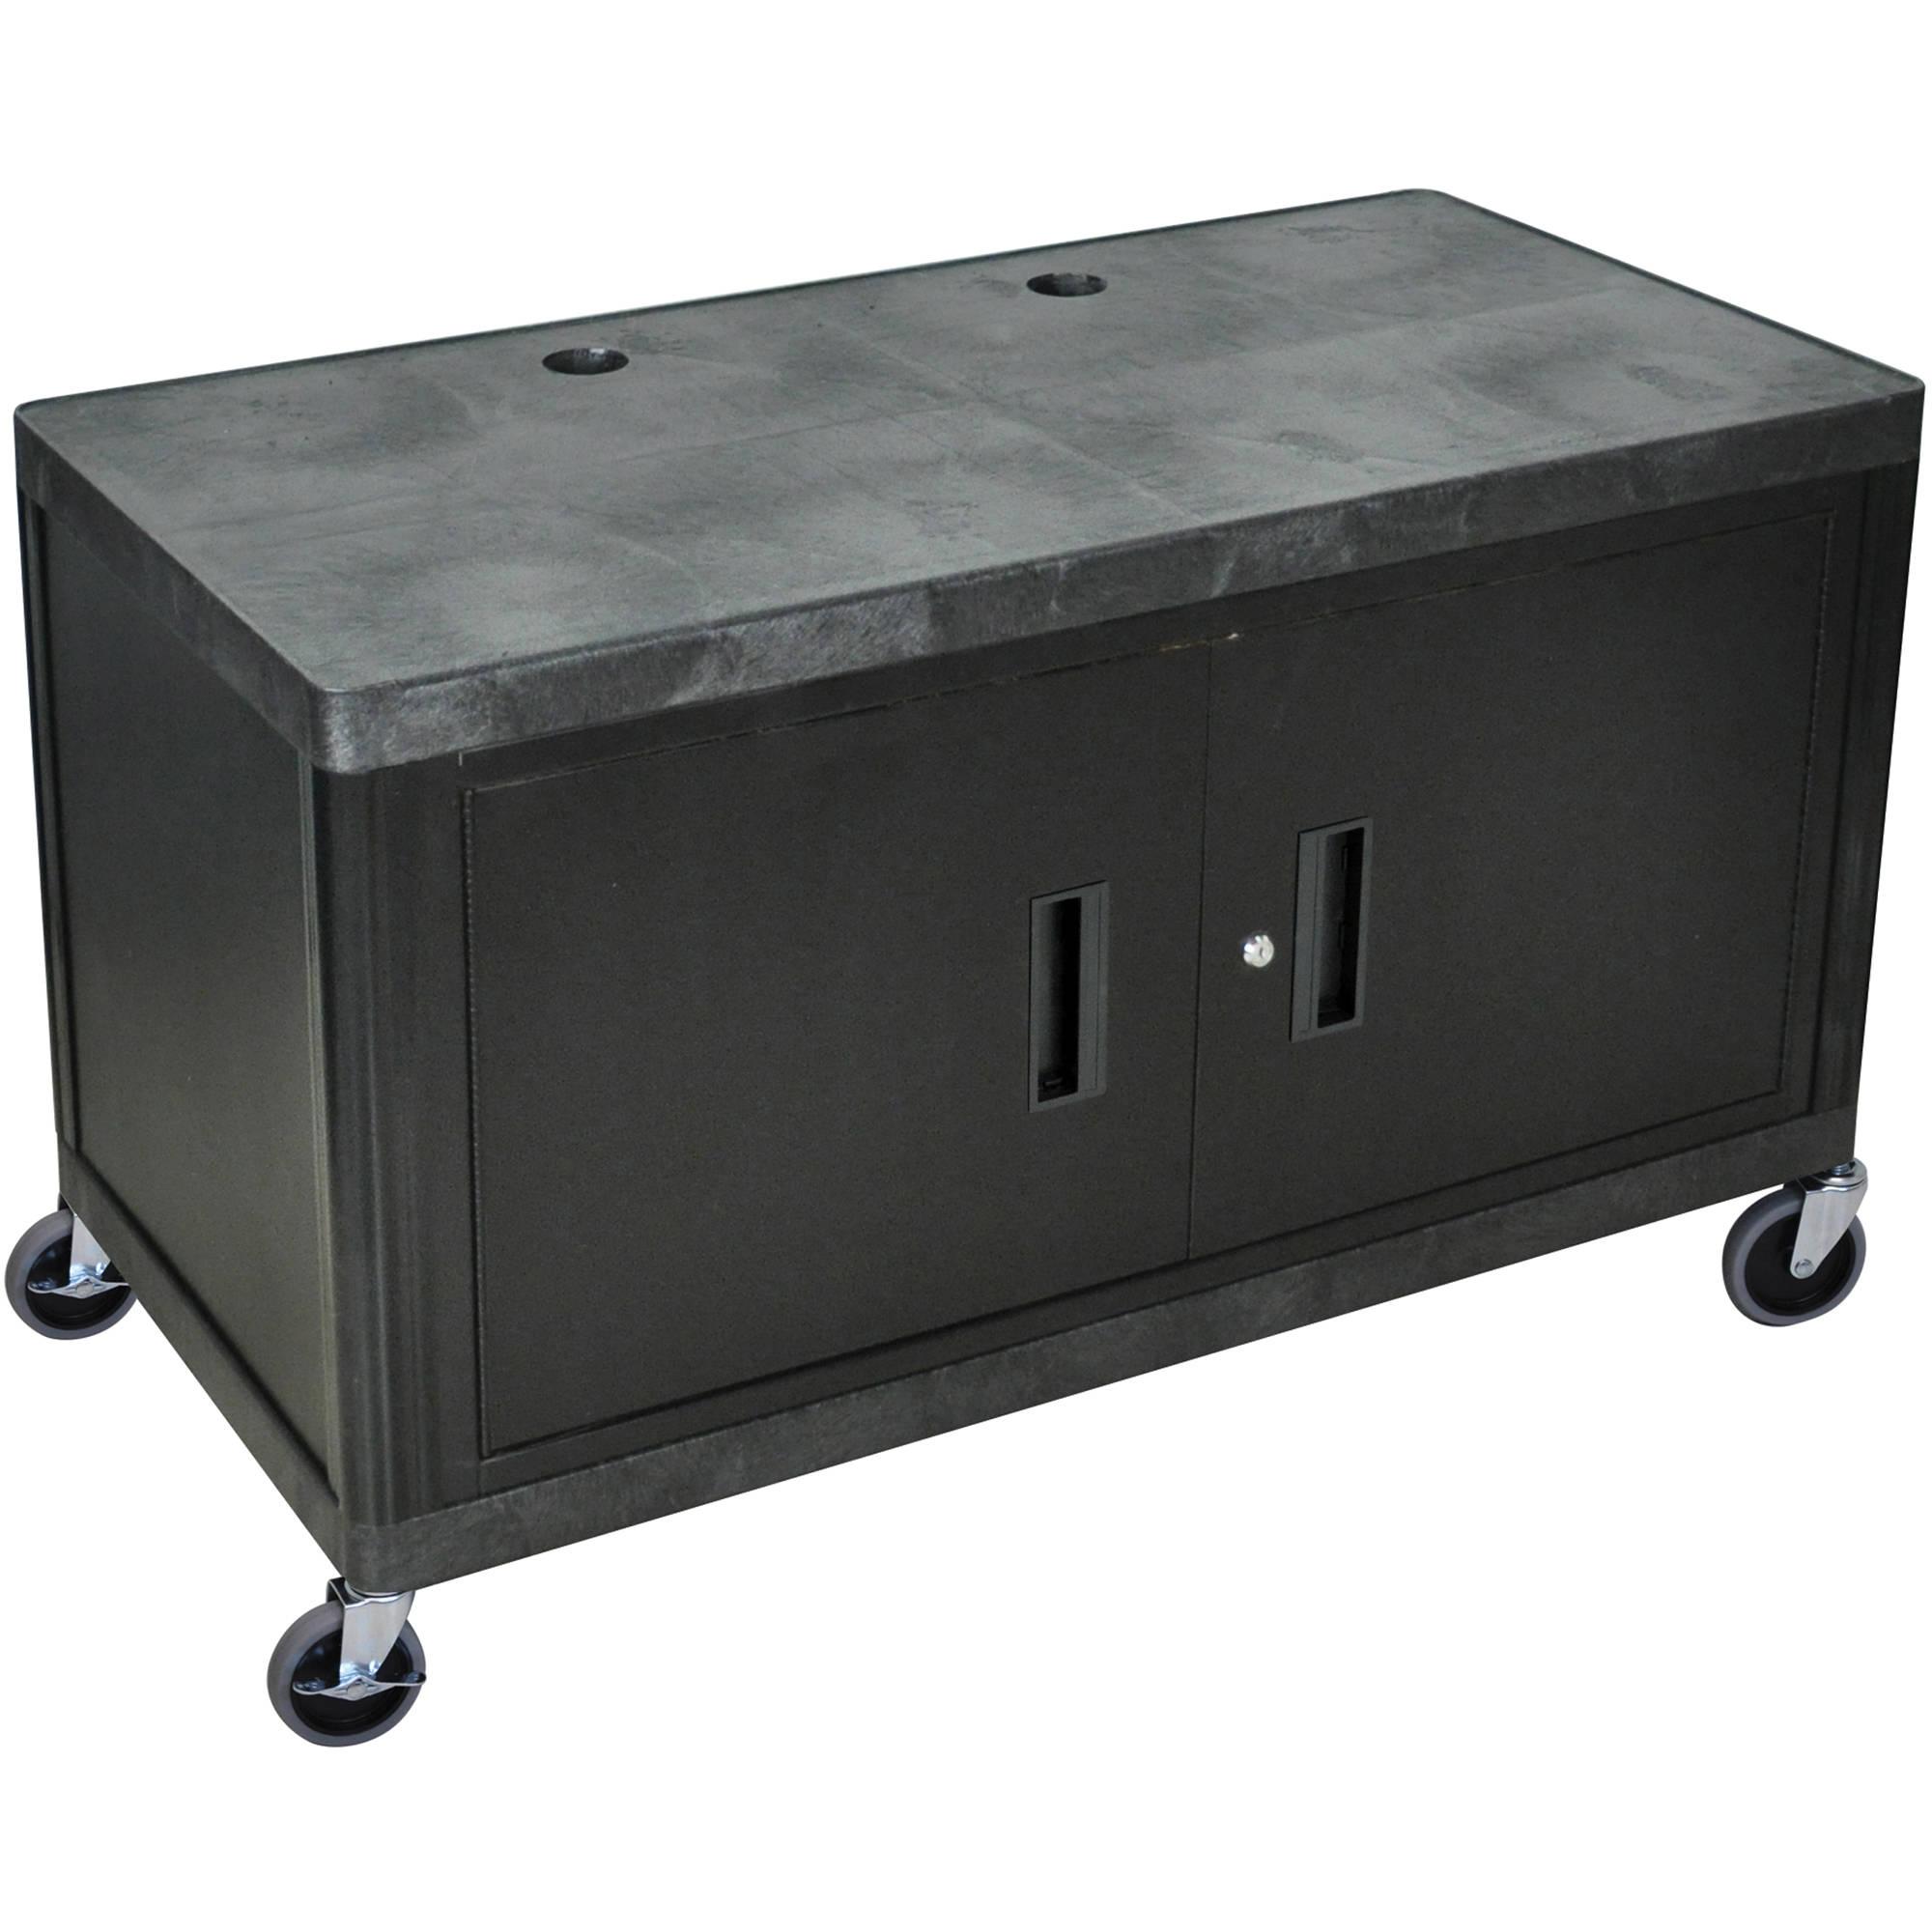 Luxor Kitchen Cabinets: Luxor 2-Shelf Heavy-Duty Work Center With Cabinet, LEW29C